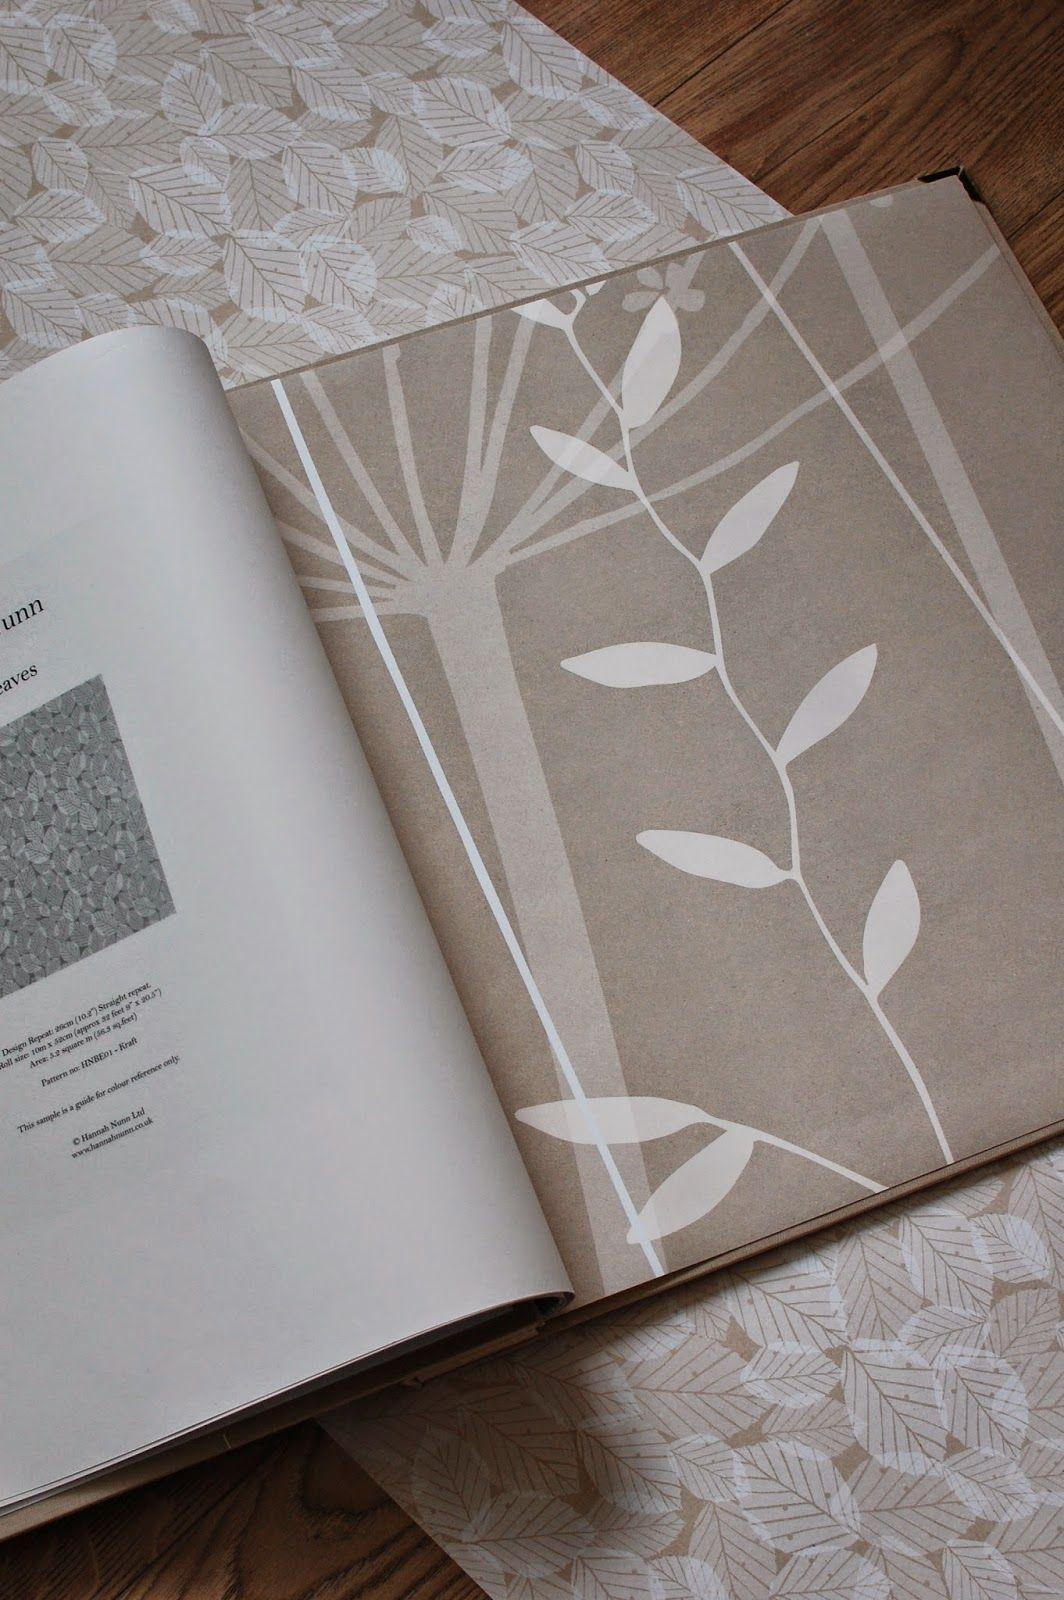 Hannah Nunn Hannah Nunn wallpaper sample books Интерьер